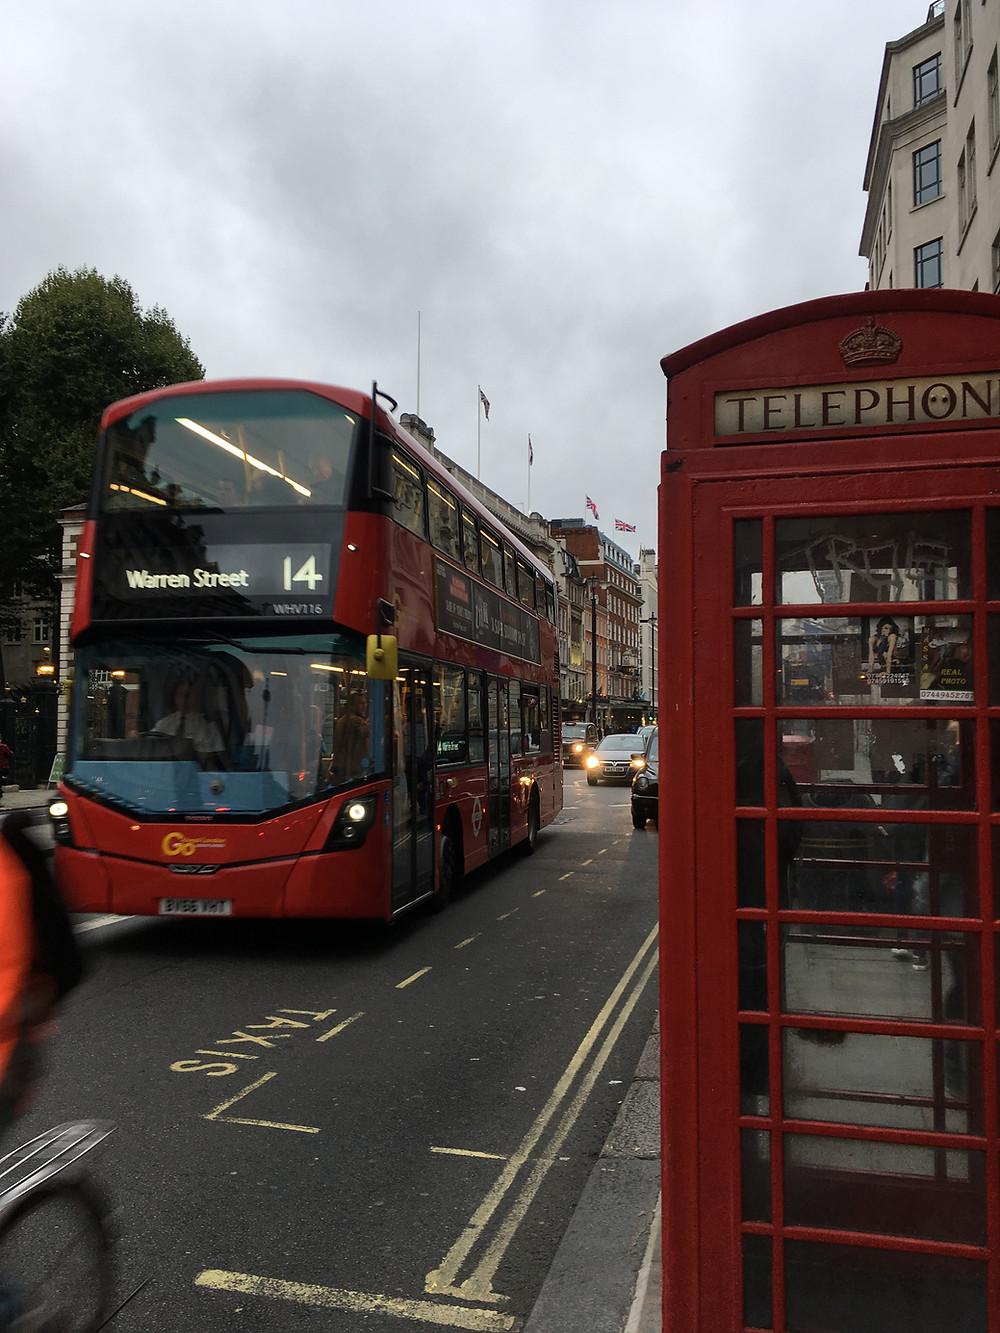 Os clássicos ônibus ingleses